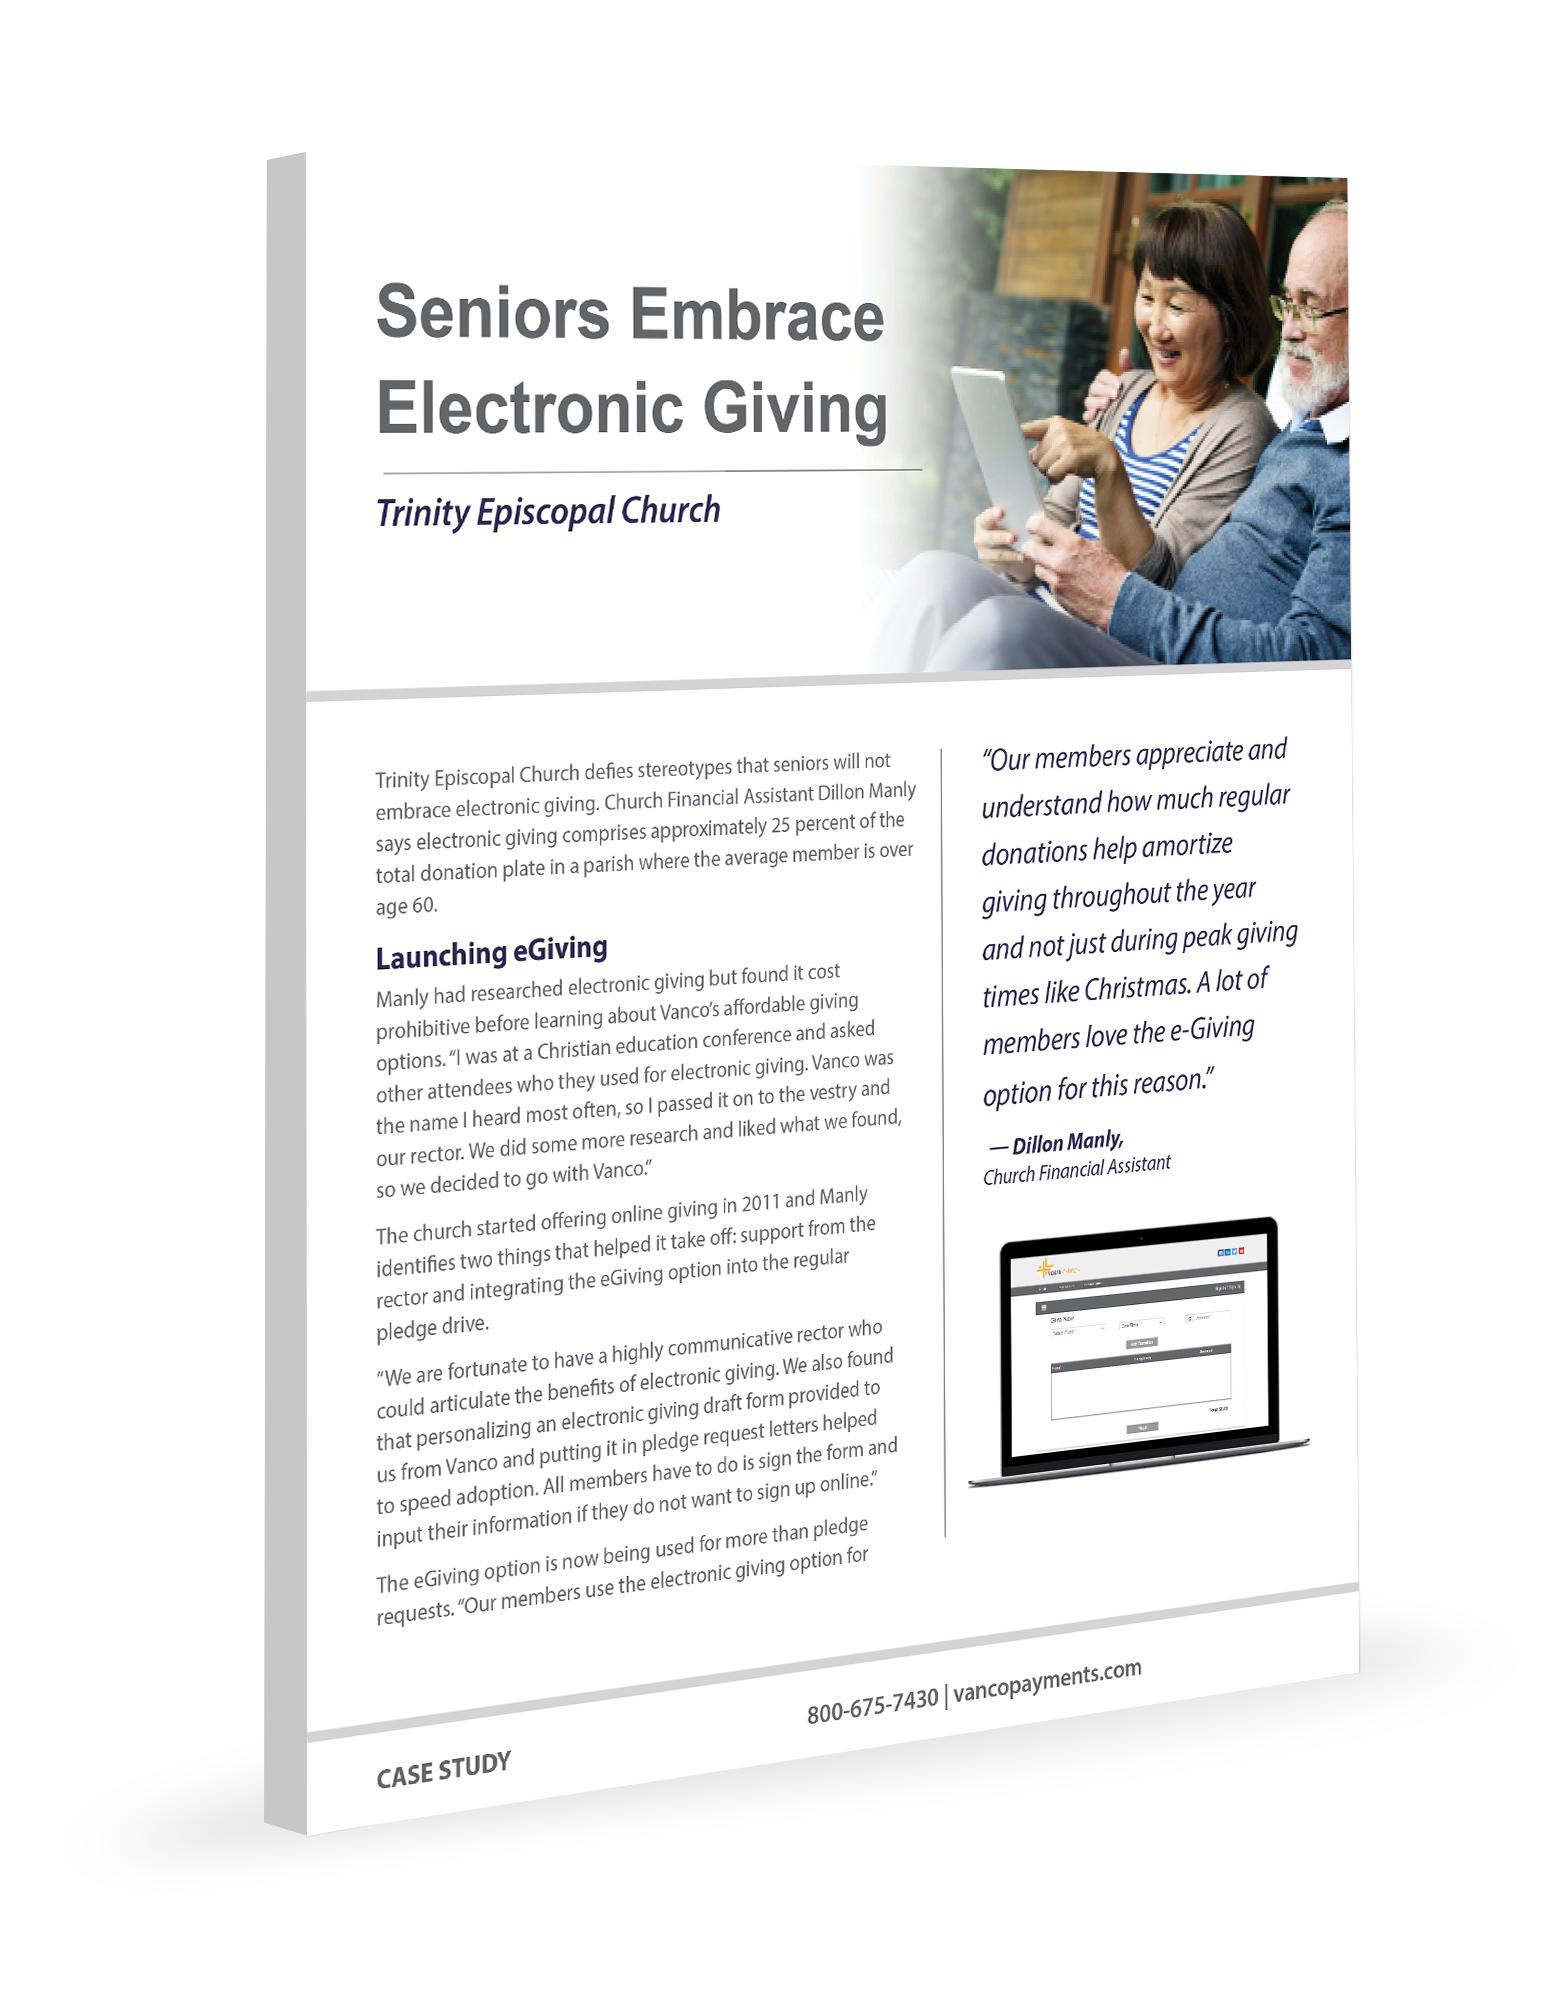 Seniors and eGiving